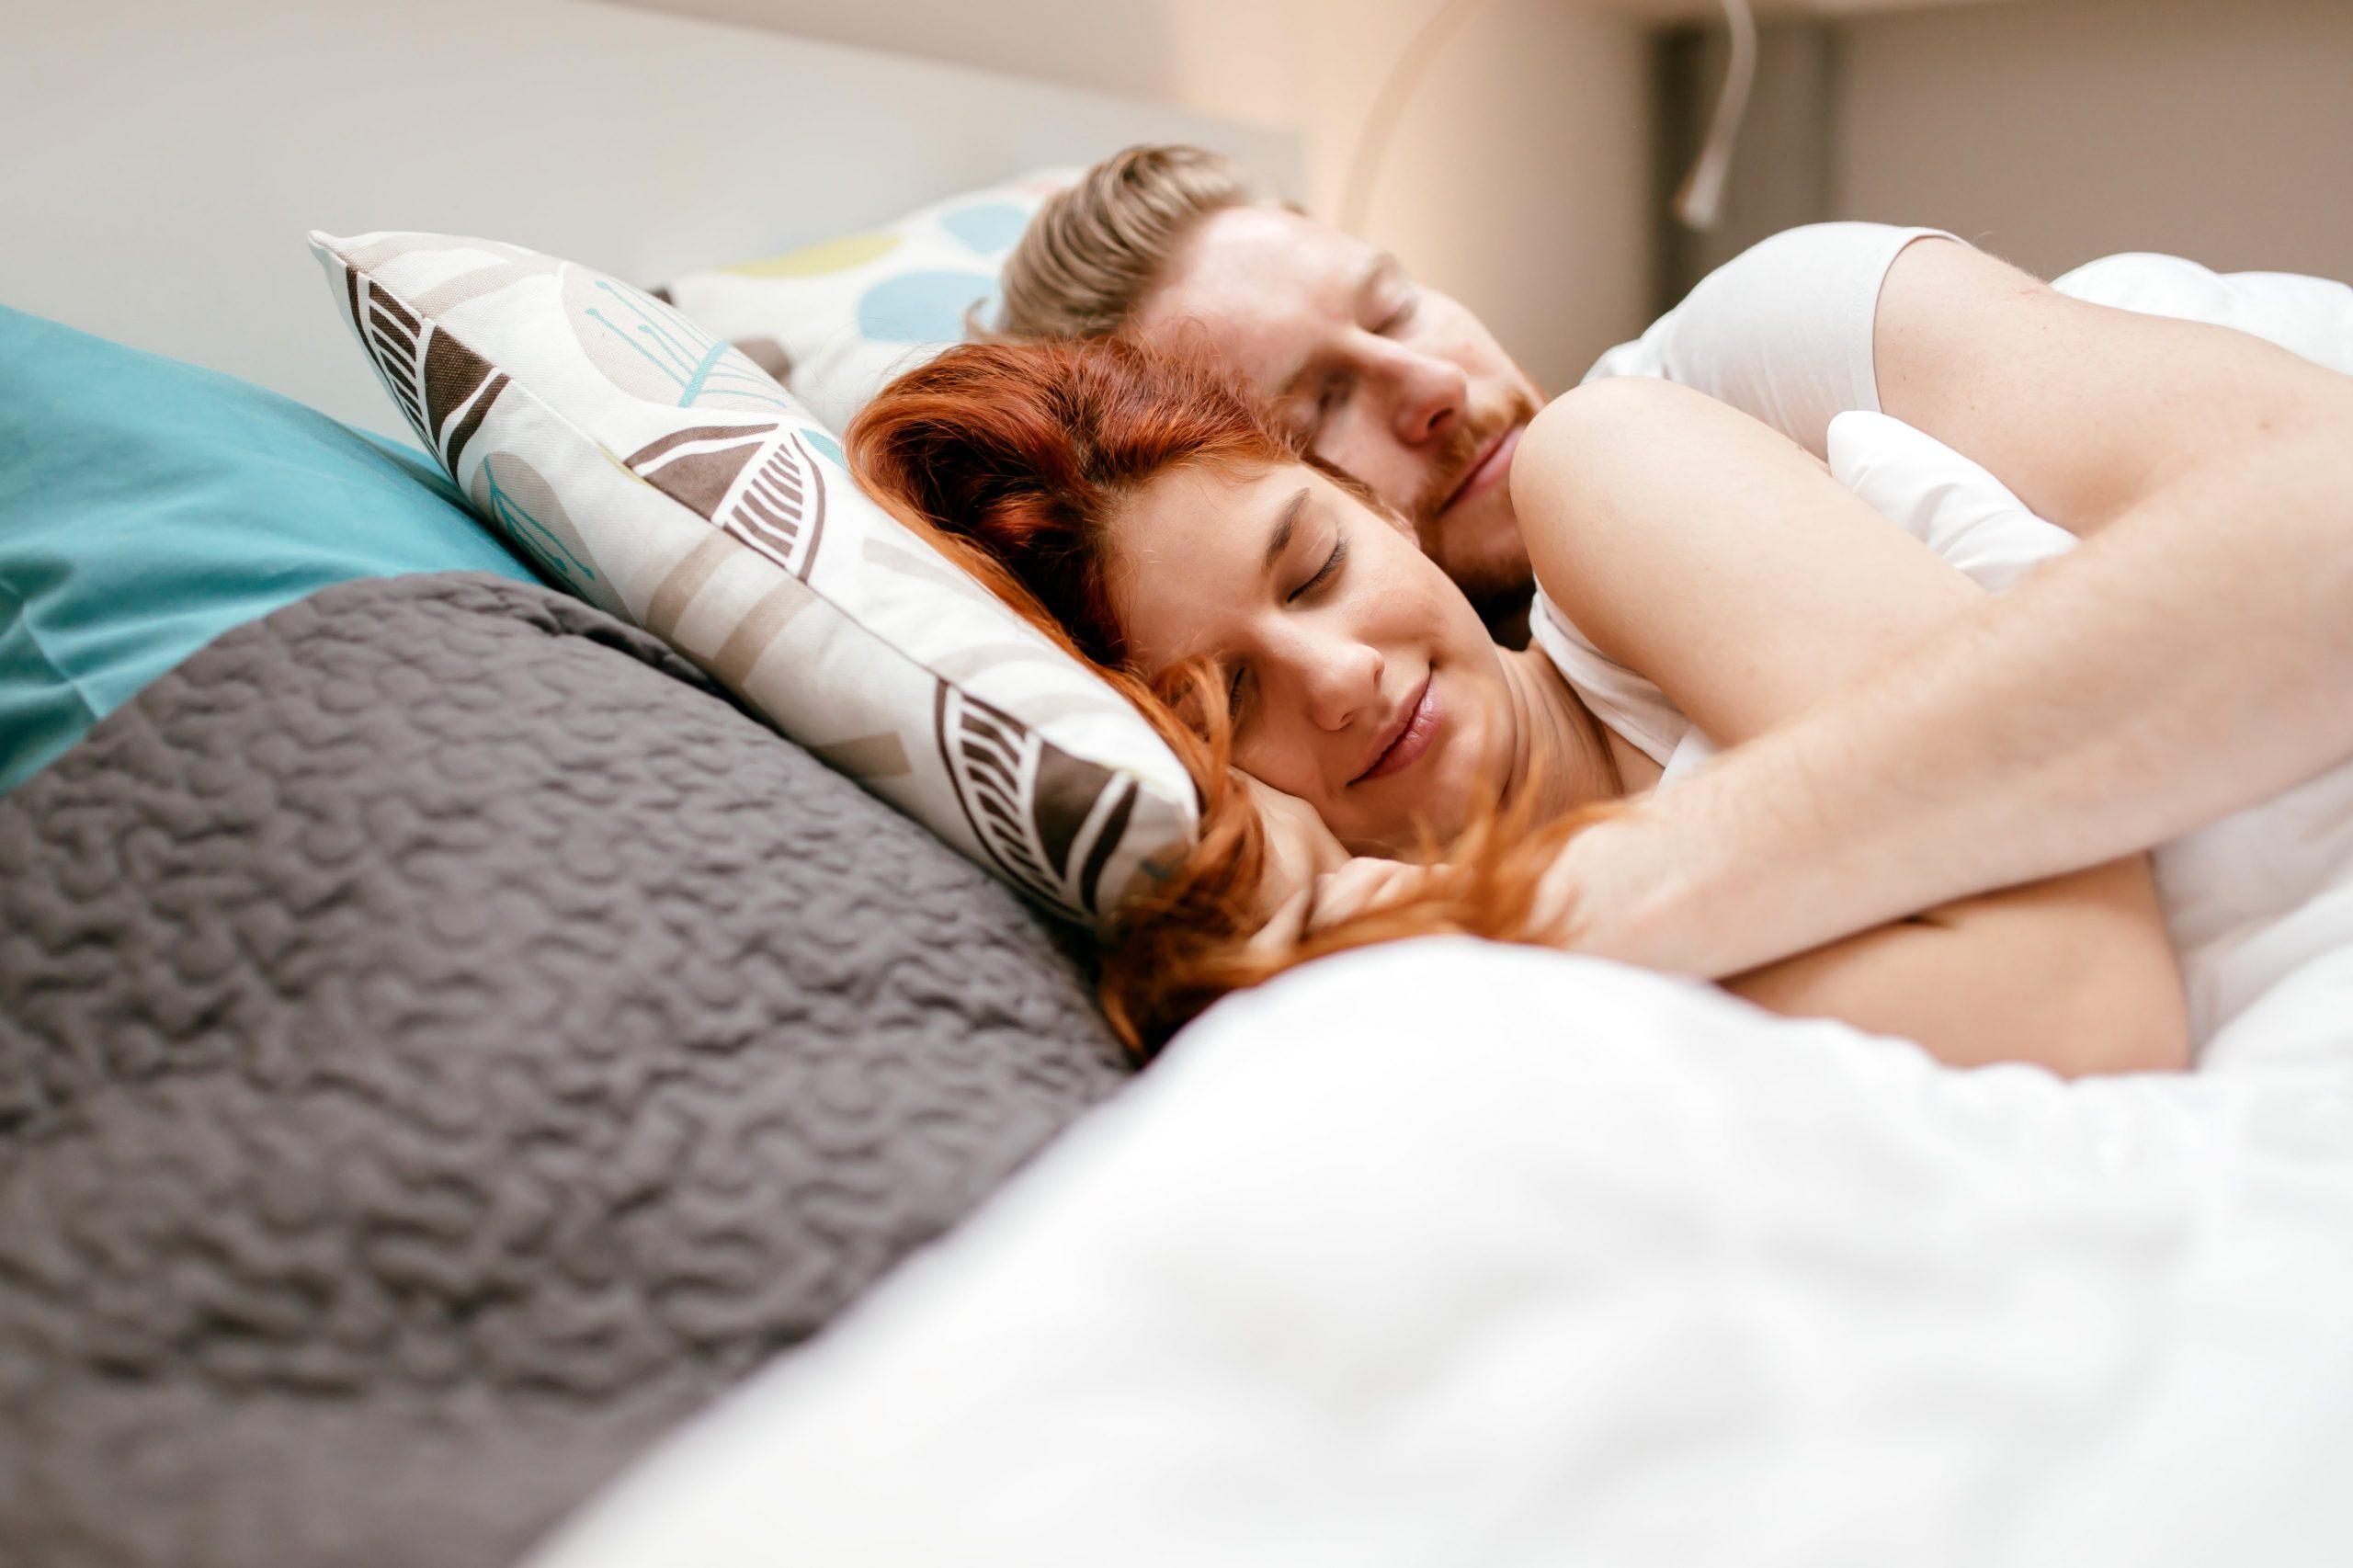 Couple going through infertility sleeping